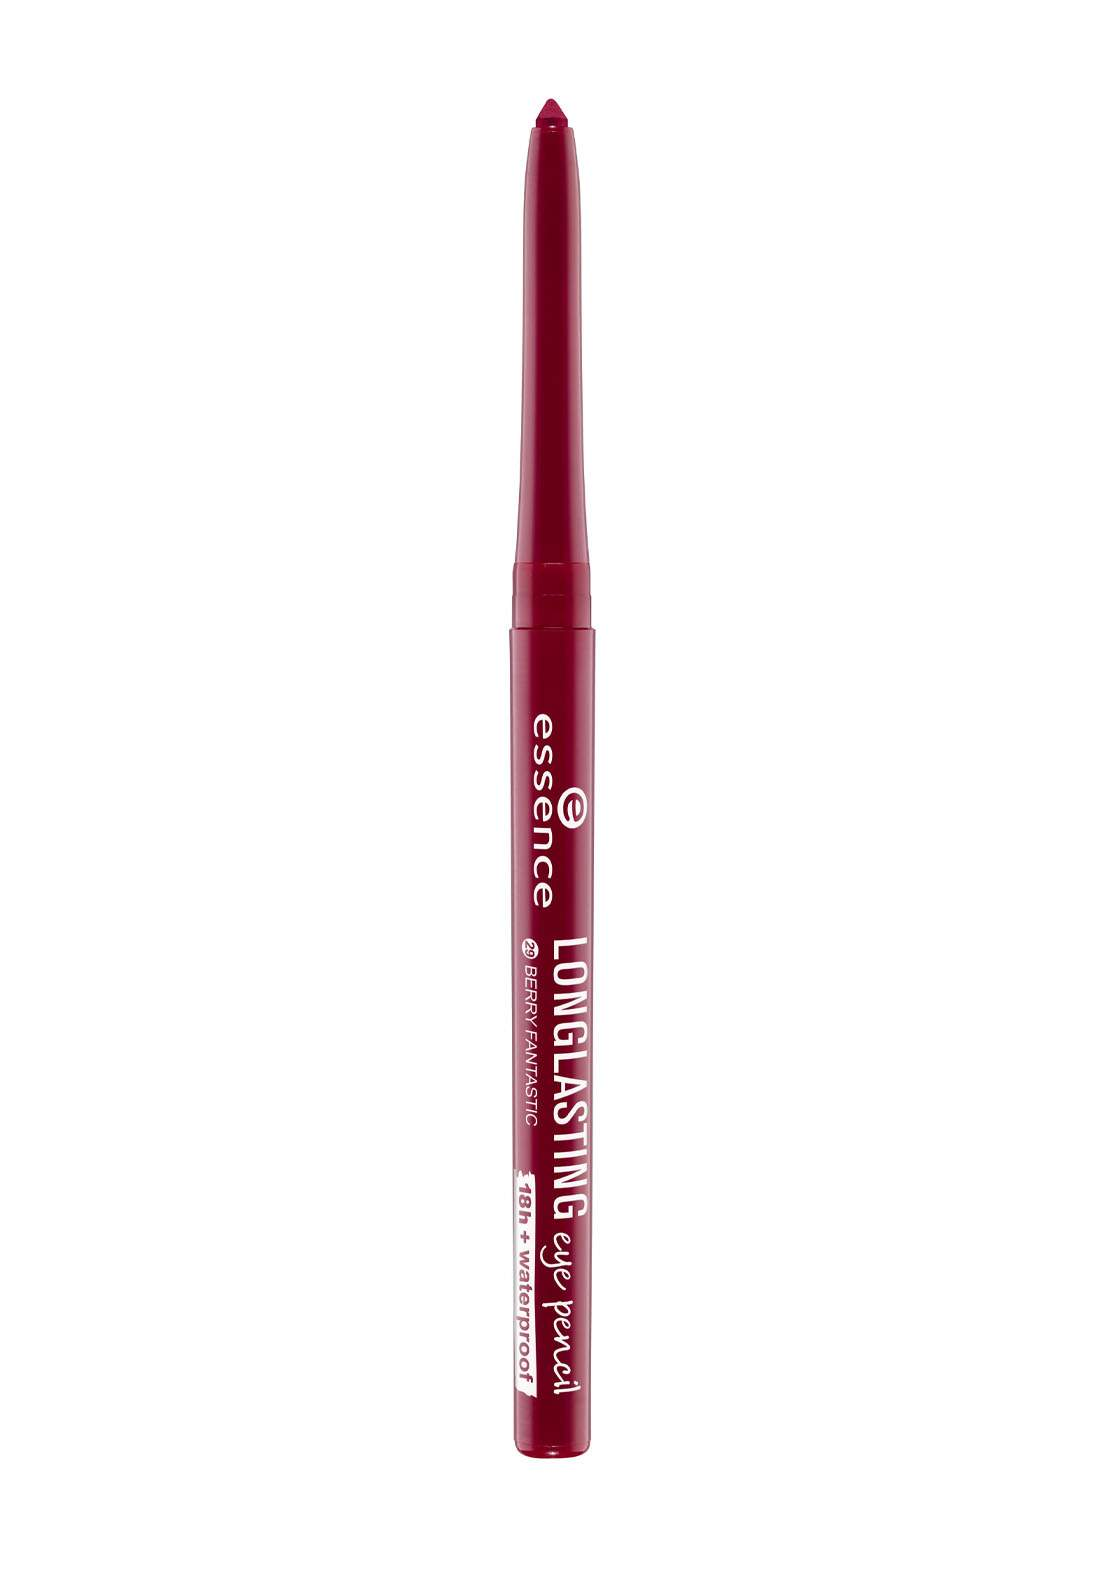 Essence Long Lasting Eye Liner No.29 Berry Fantastic  محدد العيون